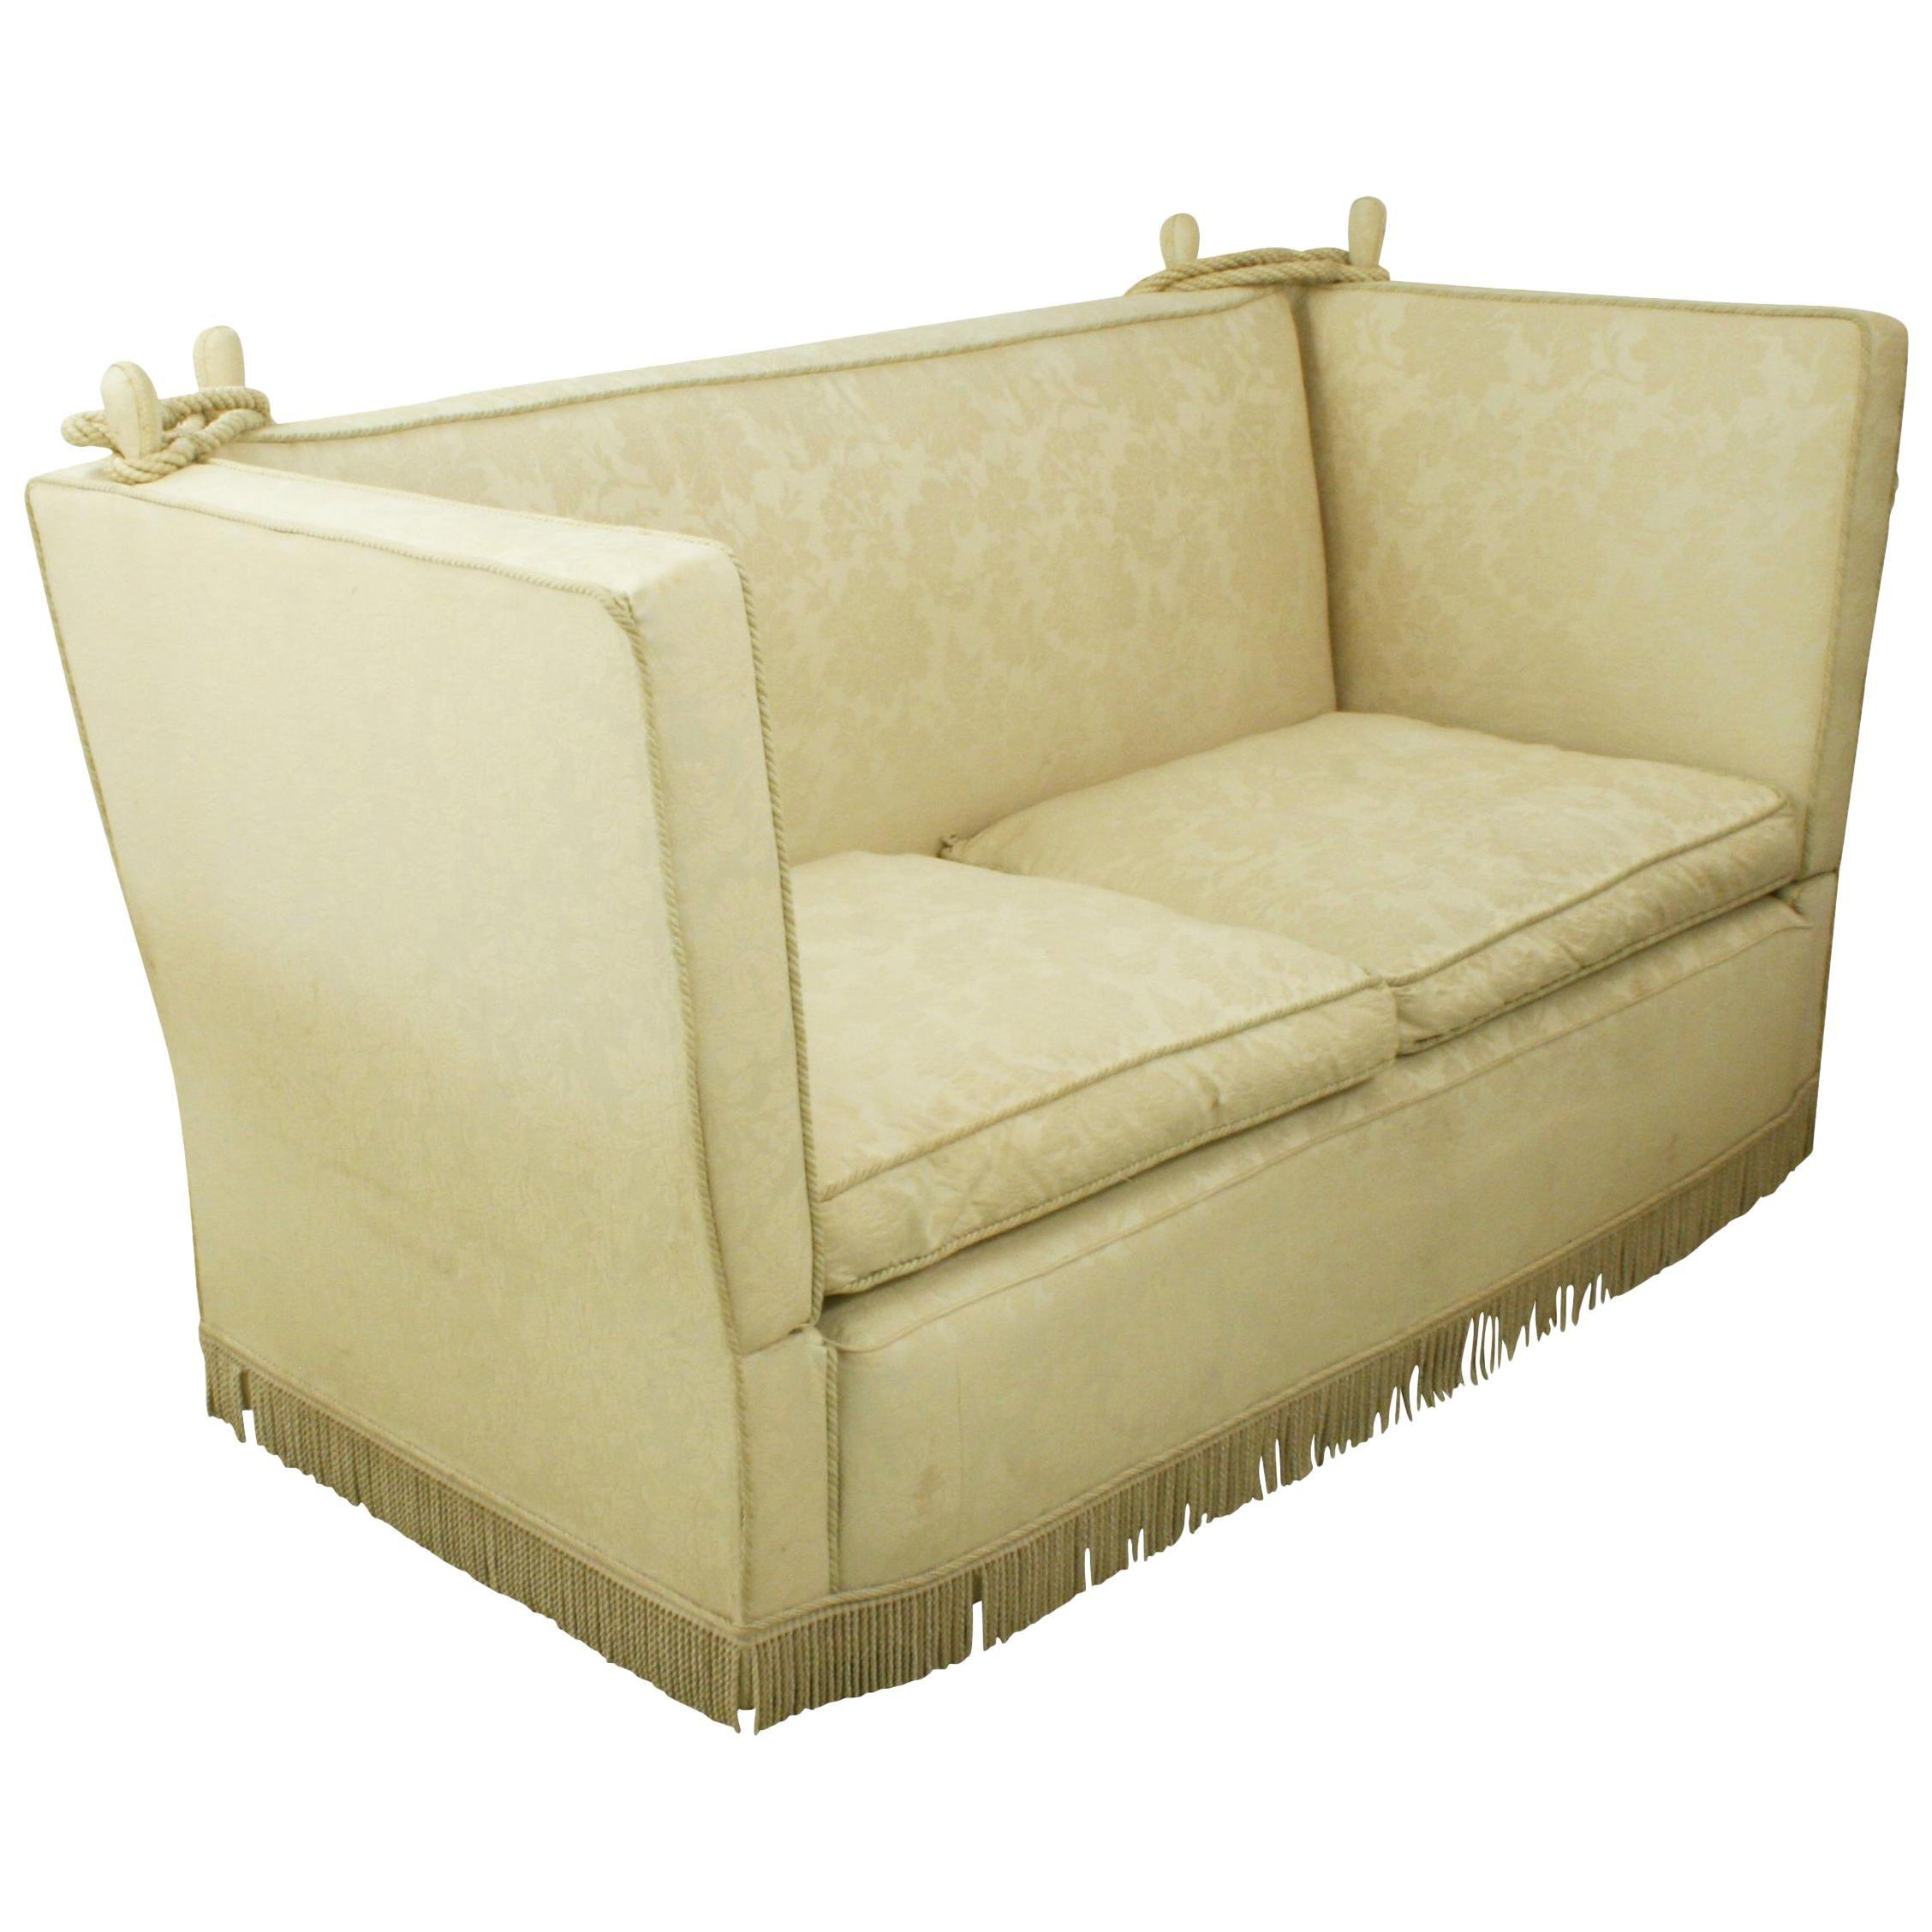 Antique Knole Sofa, Sofa with Drop Down Sides, Edwardian, circa 1910